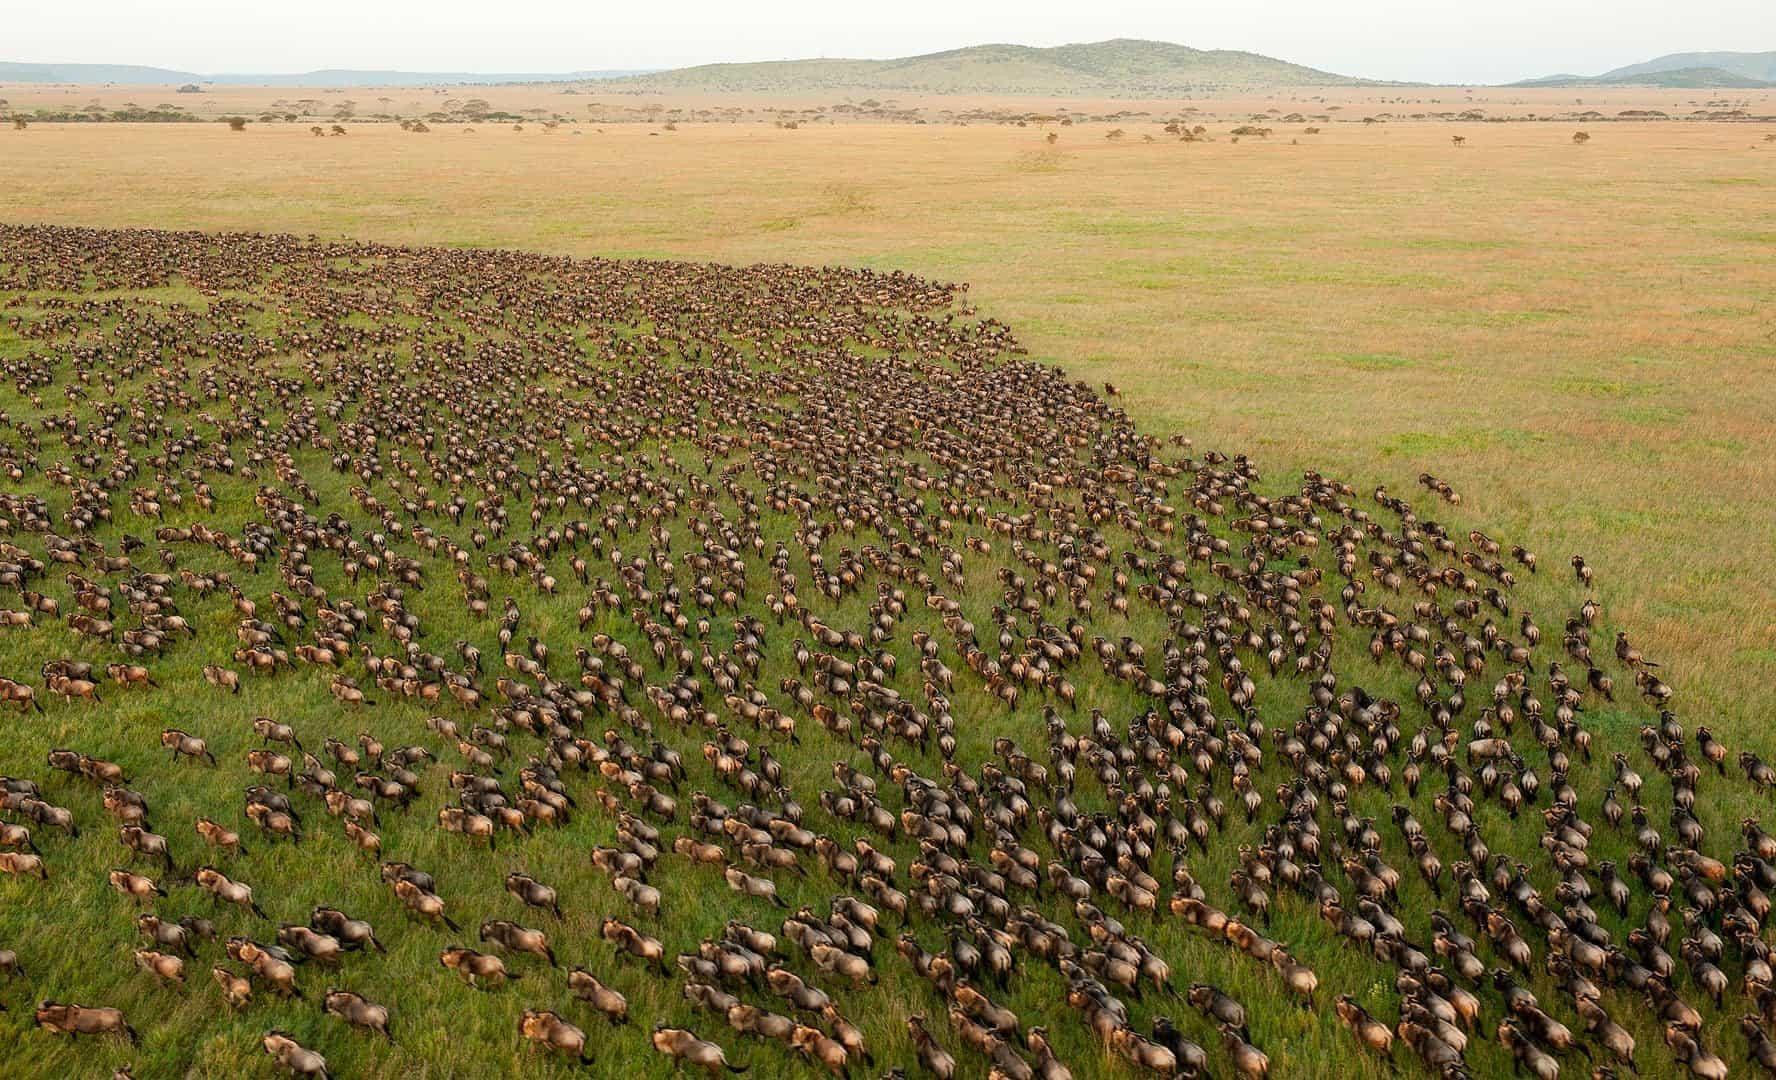 Great Wildebeest Migration in Africa